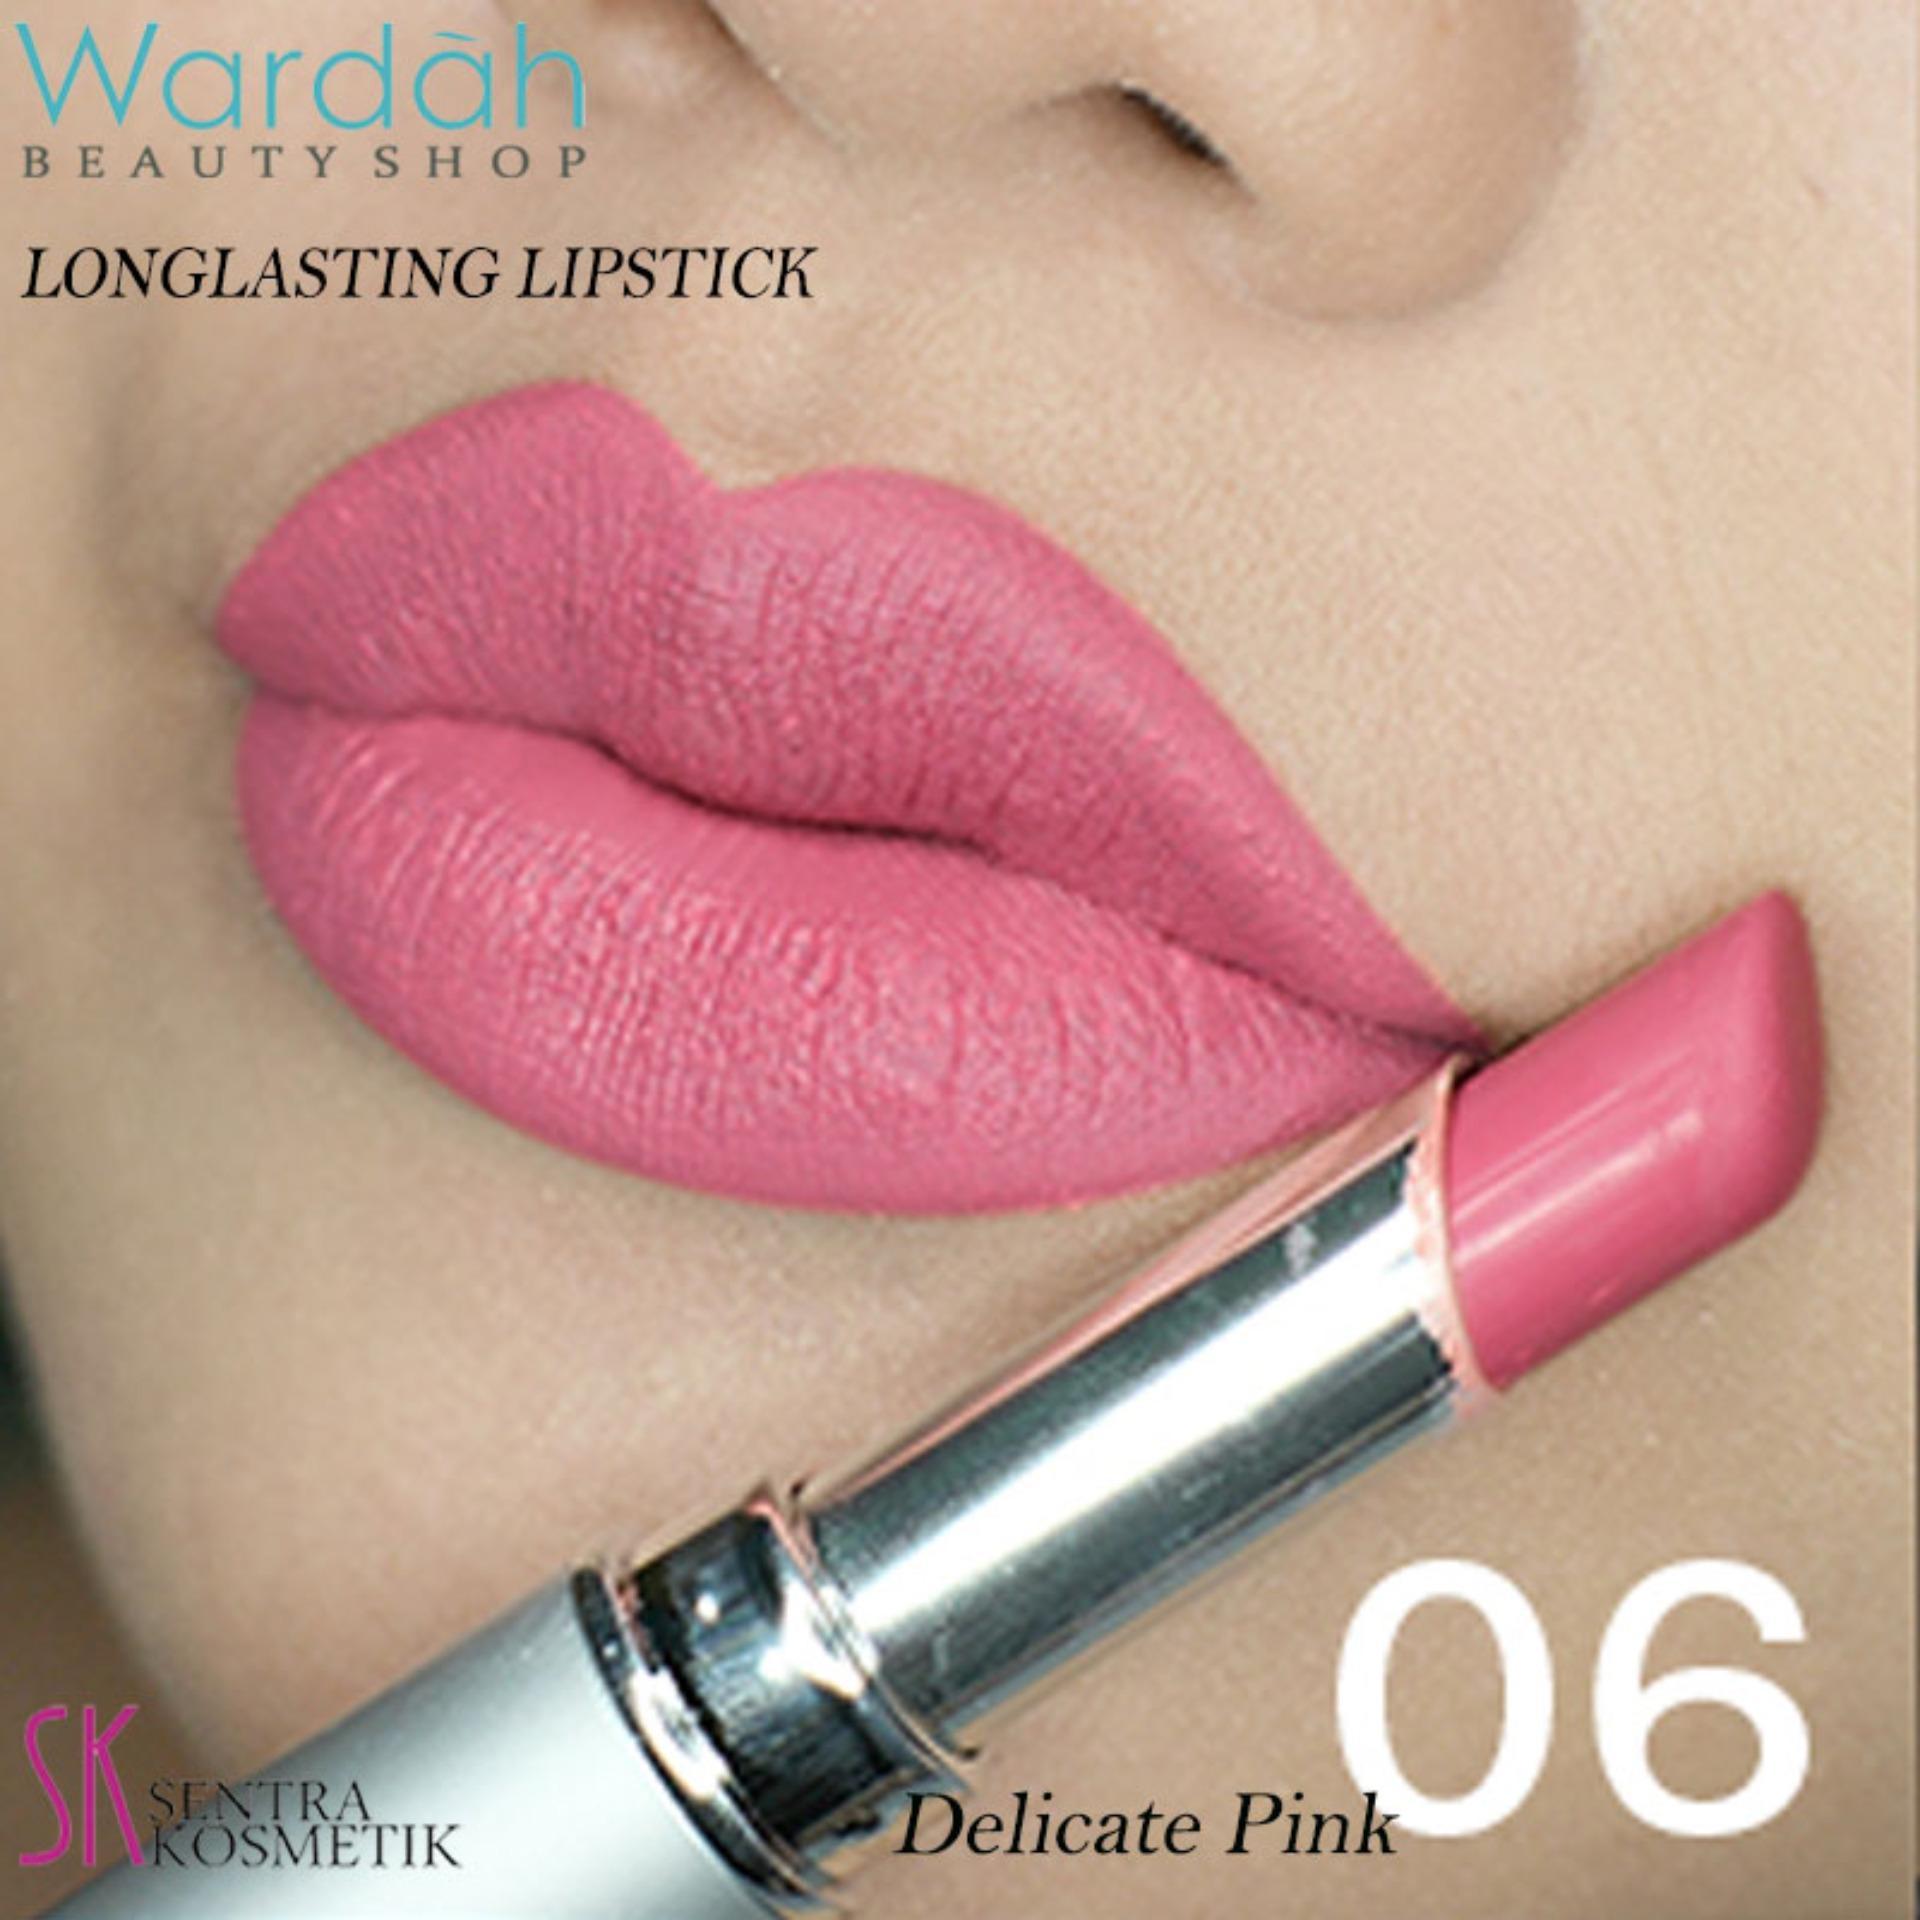 Wardah LONGLASTING Lipstick No.06 Delicate Pink